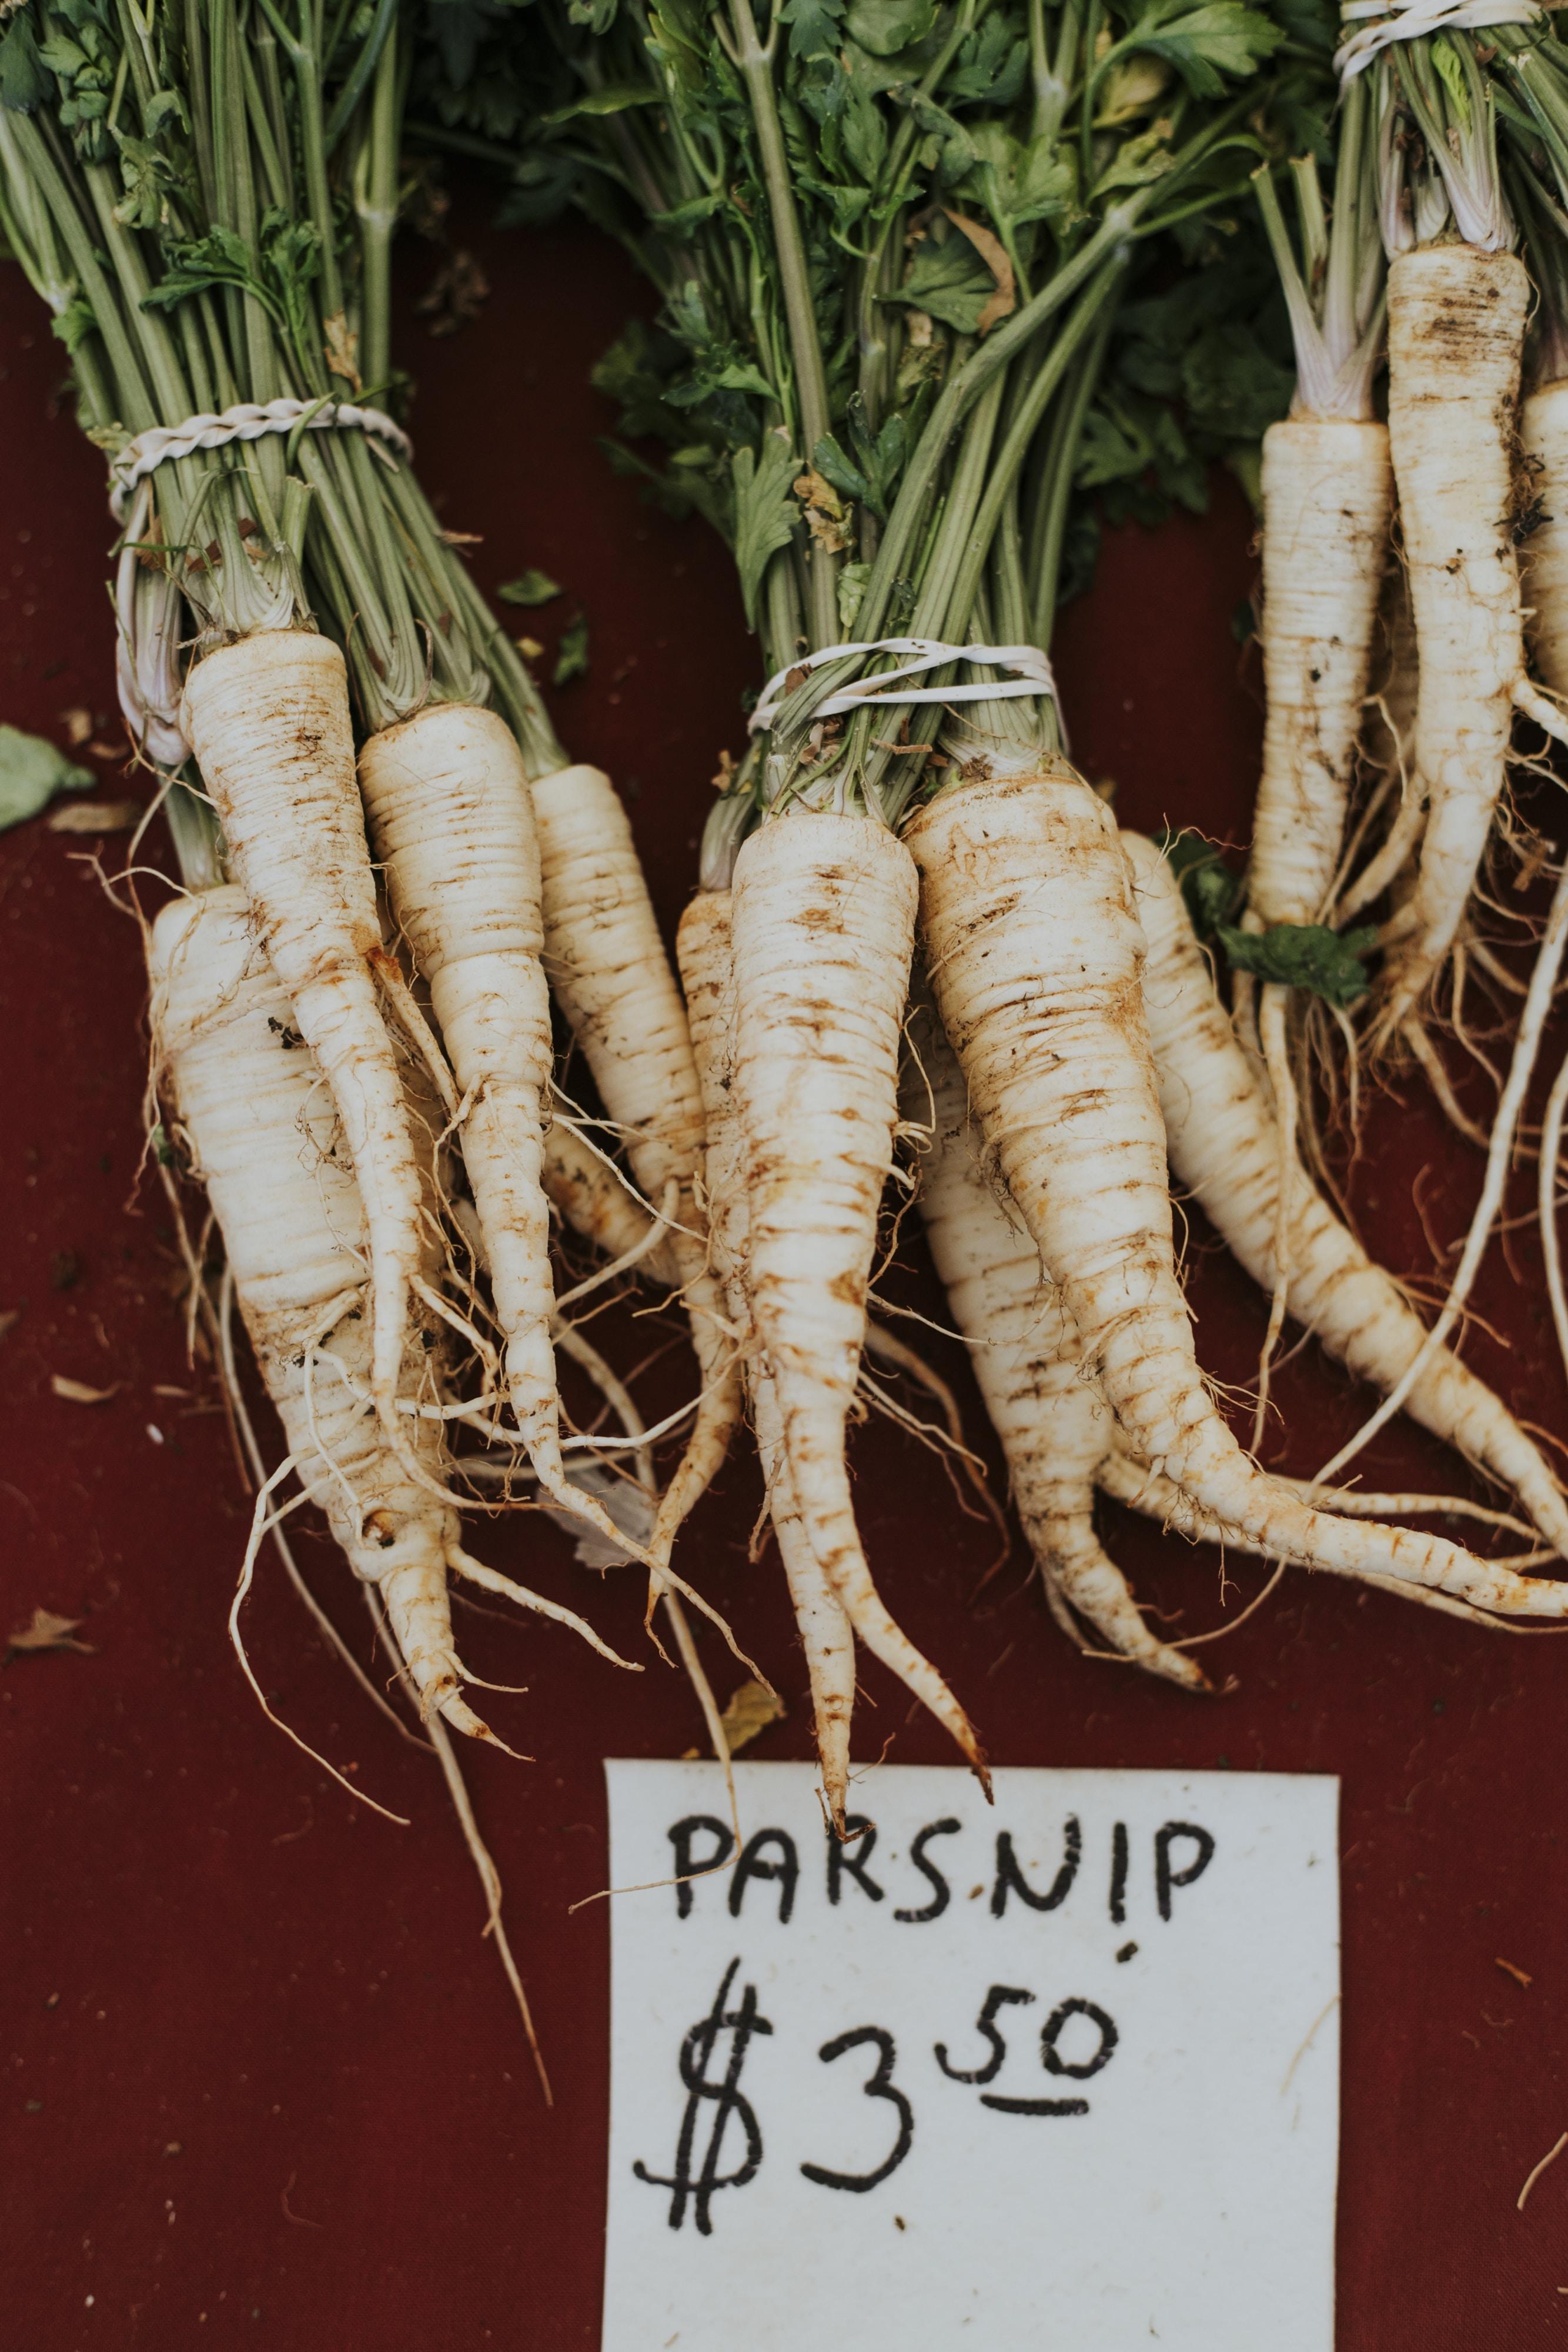 three bundles of parsnip